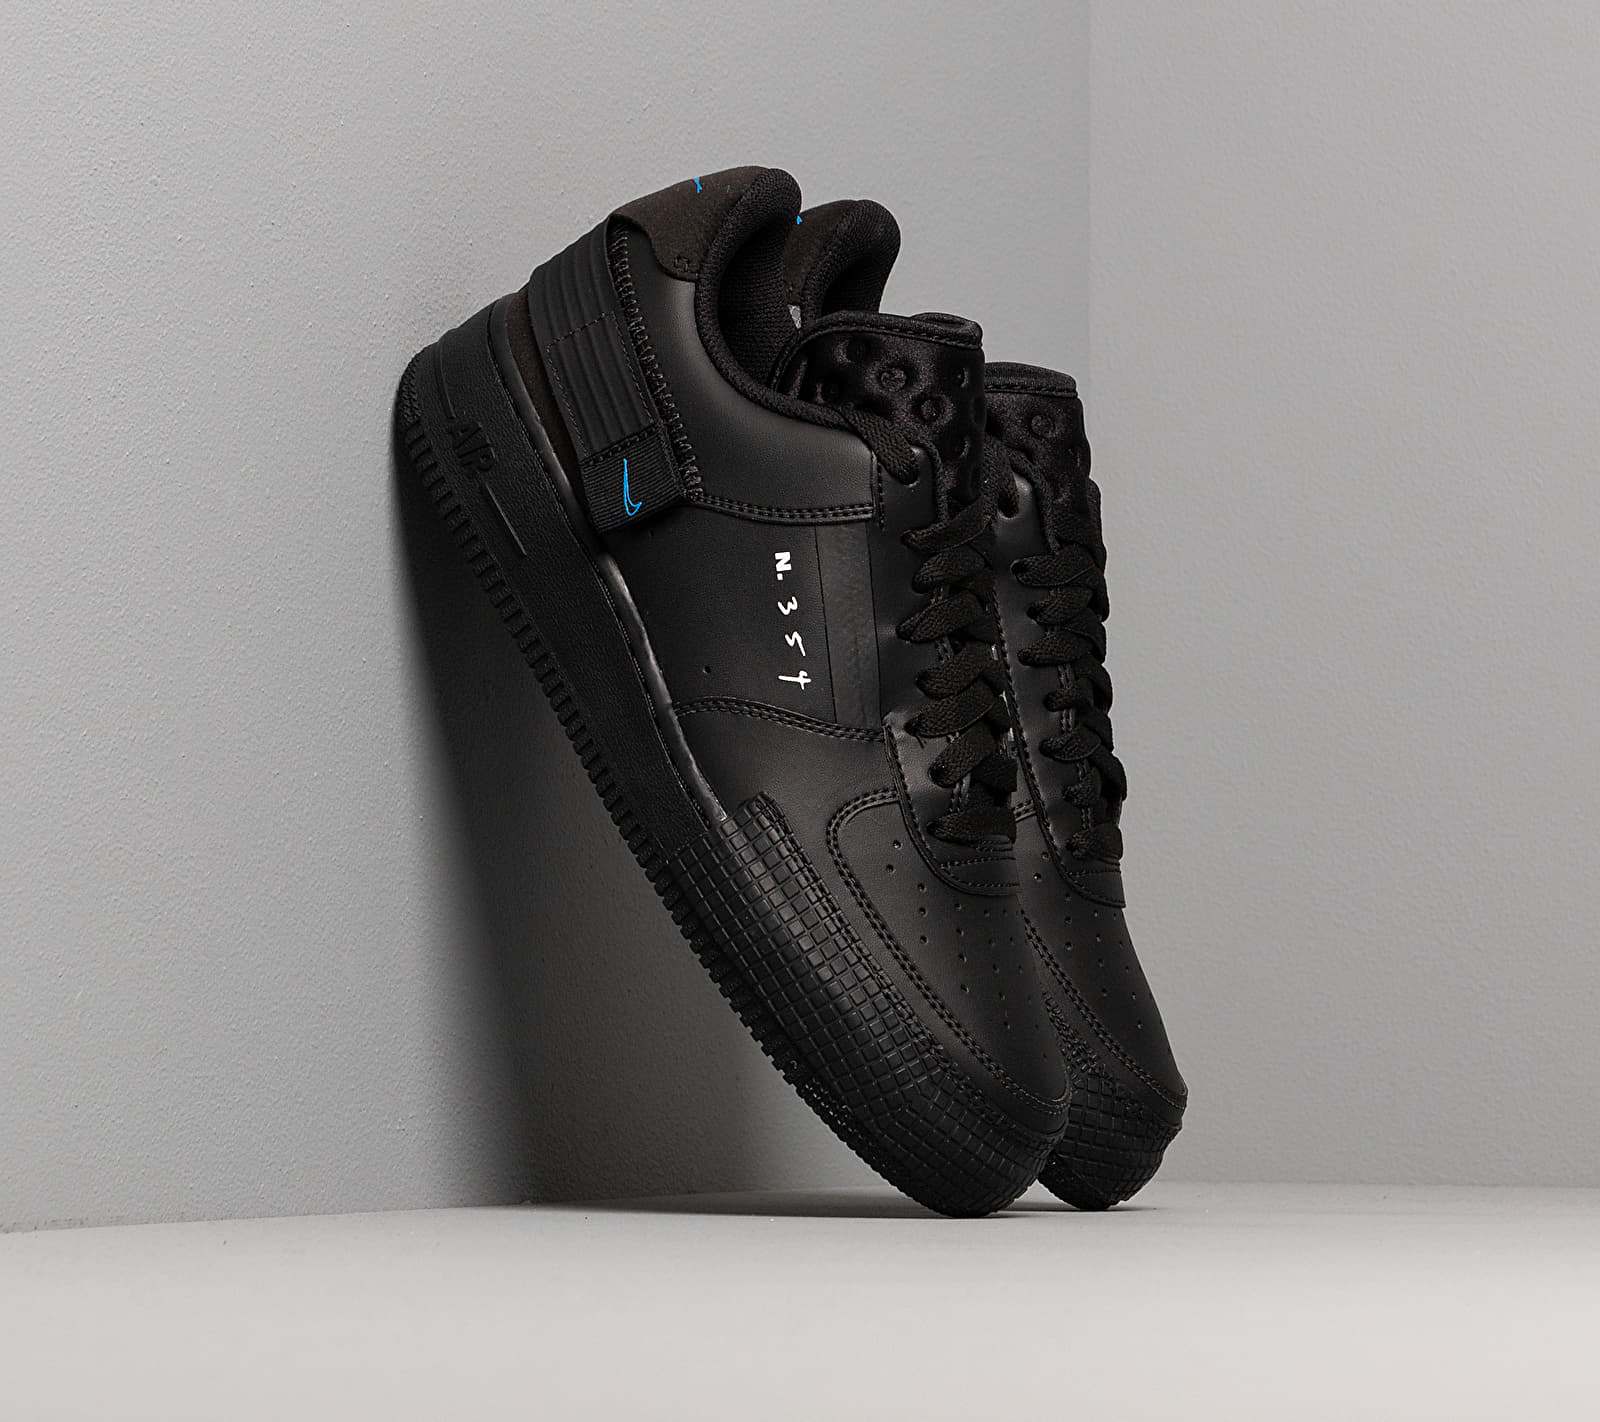 Nike Air Force 1-Type Black/ Photo Blue-Platinum Tint EUR 42